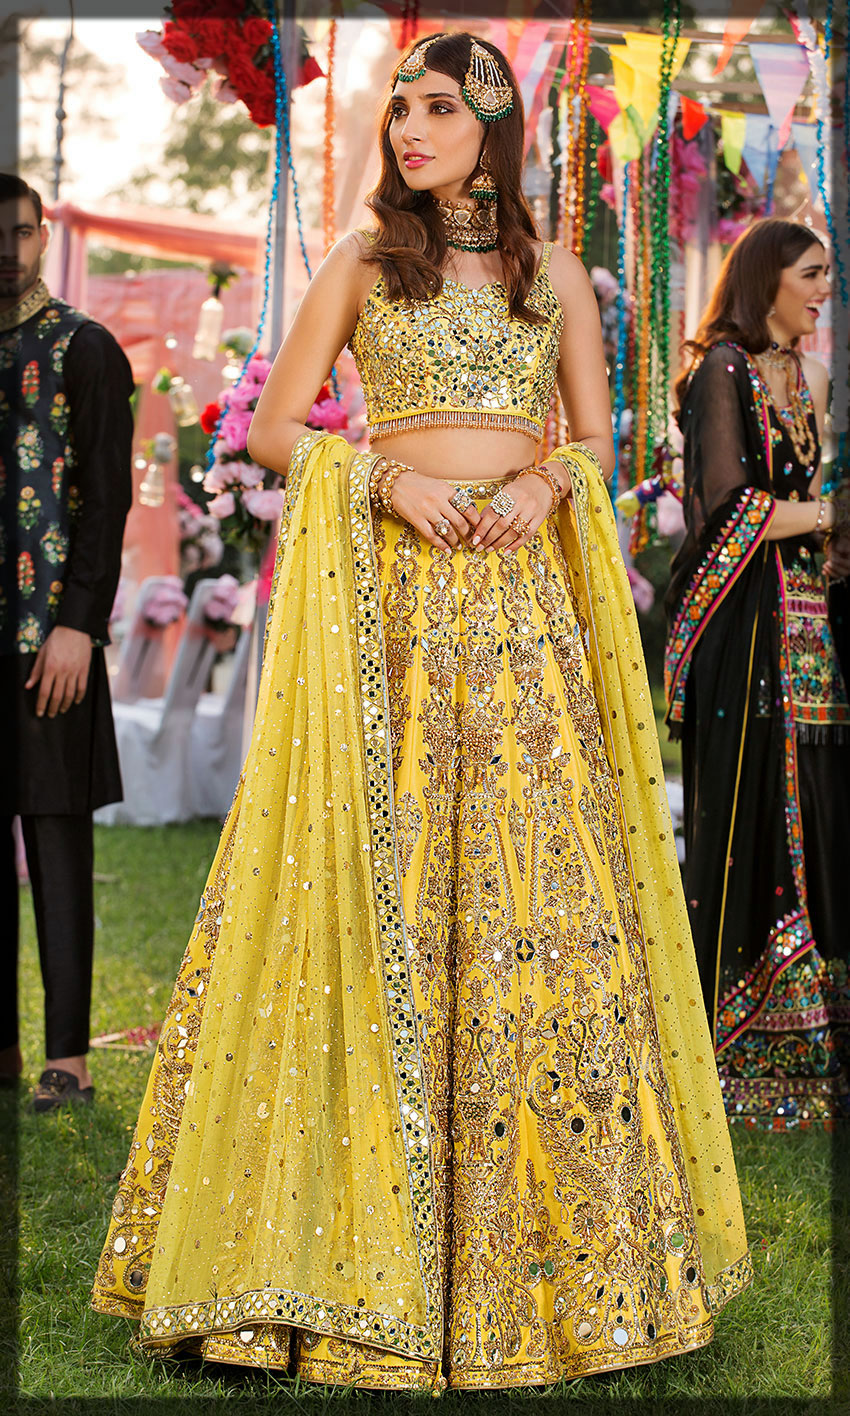 yellow emboridery dress for bride